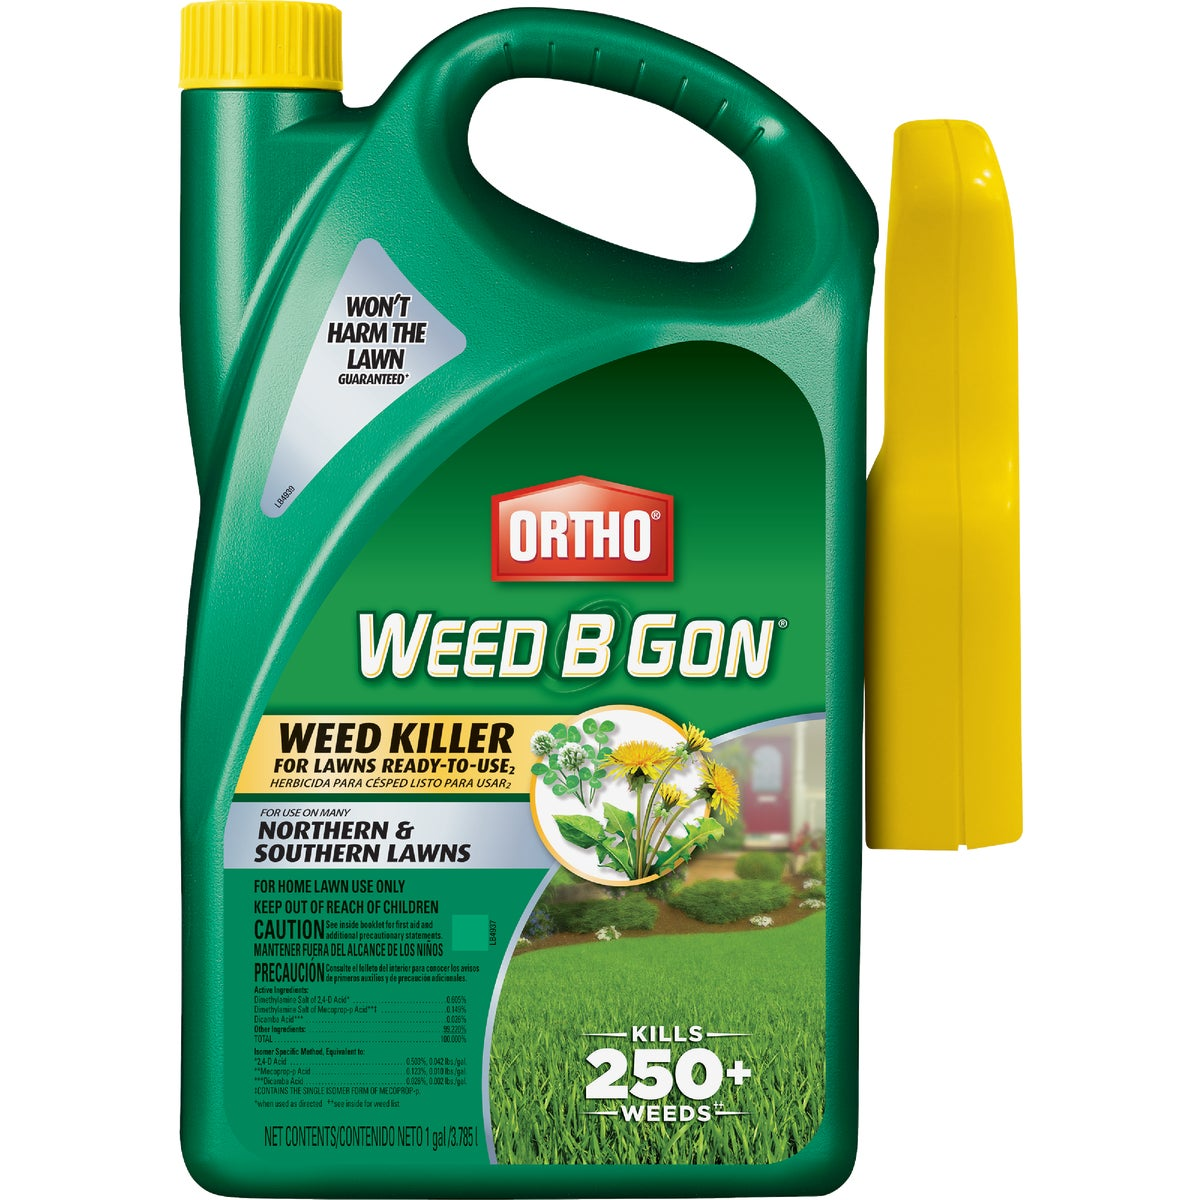 GAL RTU WEED B GON SPRAY - 0404210 by Scotts Company